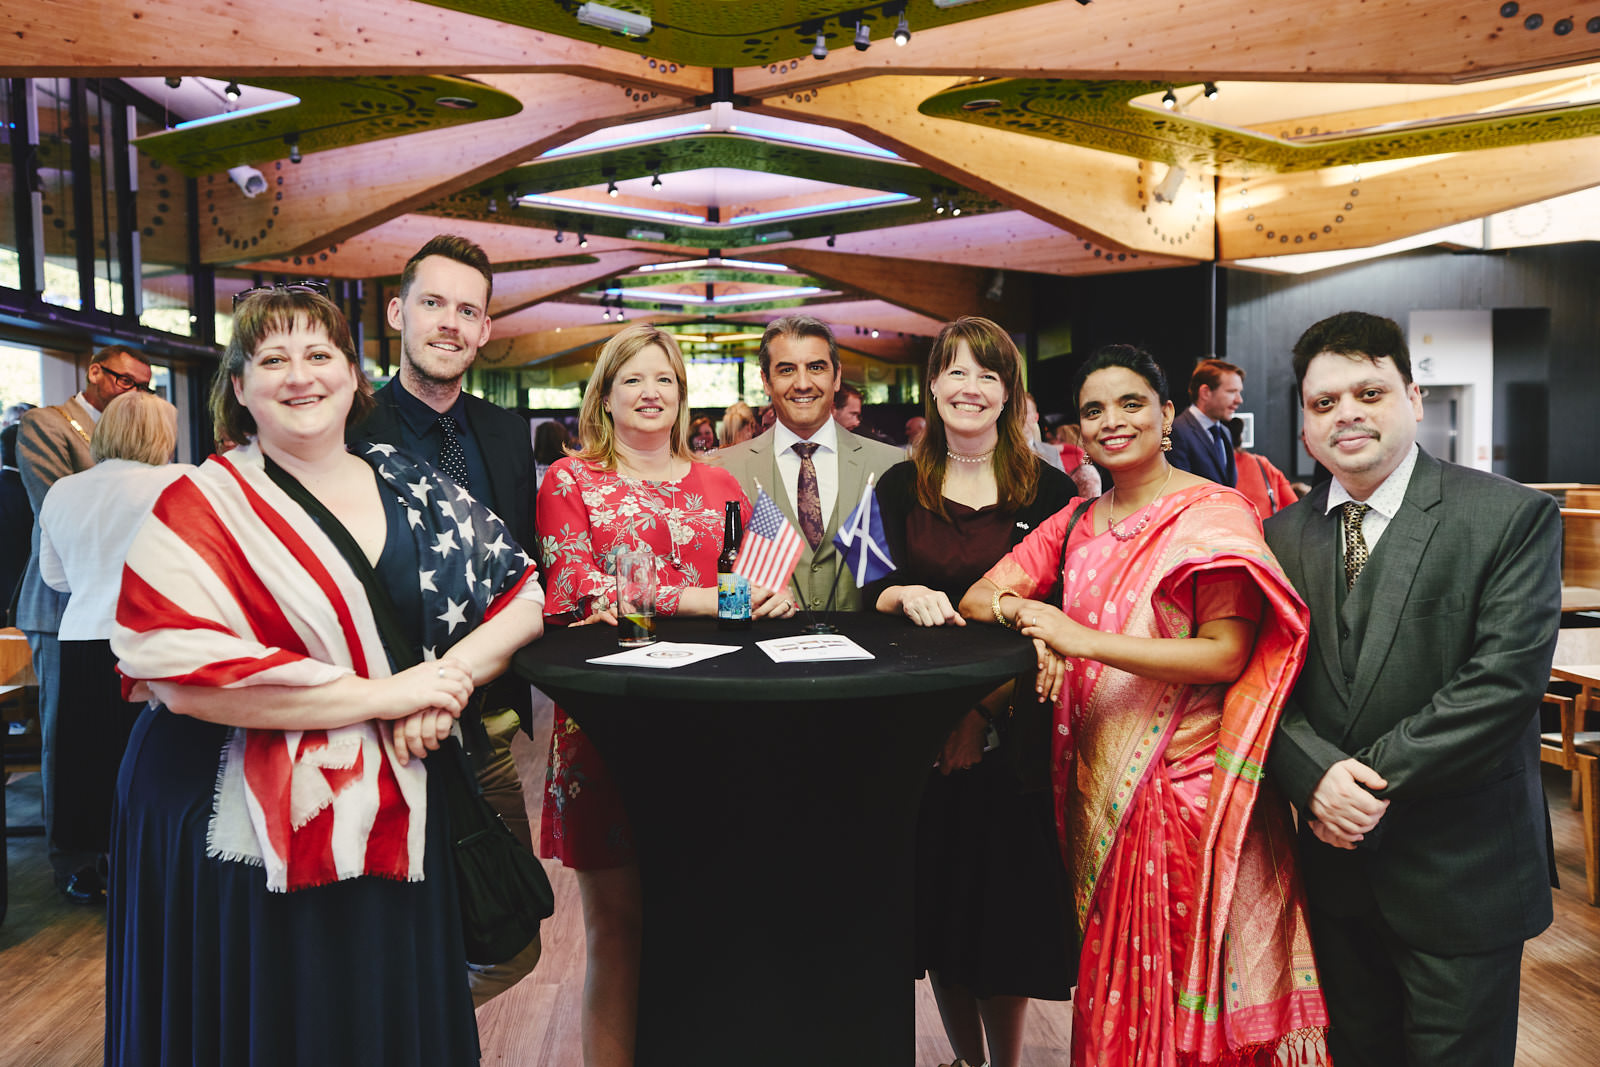 US consulate Edinburgh 4th of July celebration 2018 - 219 web.jpg